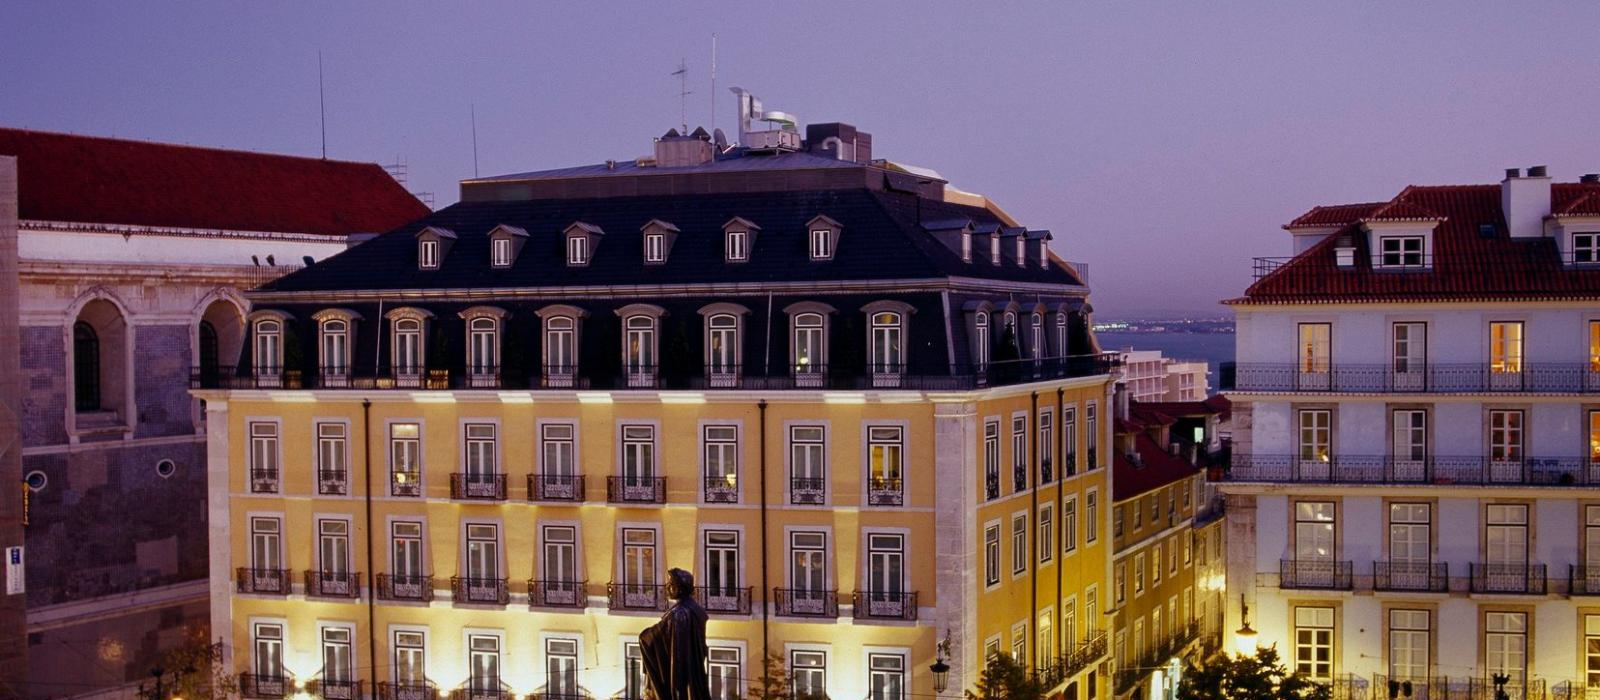 巴洛奥尔多精品酒店(Bairro Alto Hotel) 图片  www.lhw.cn